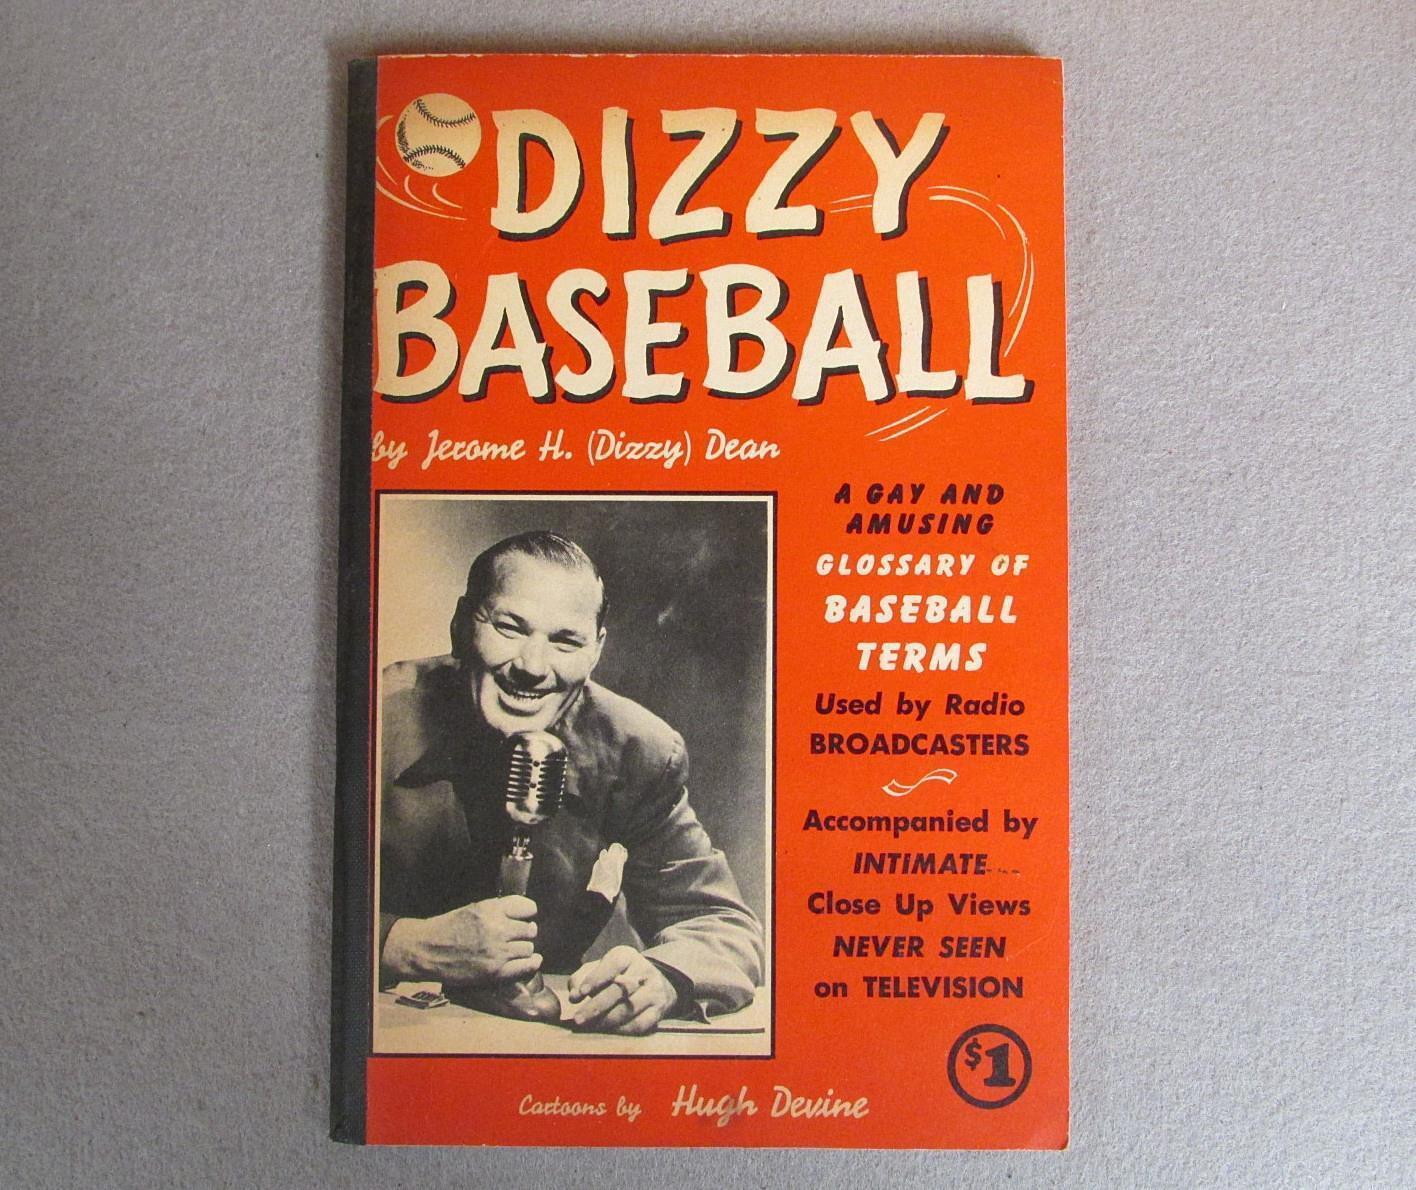 Vintage 1950 S Dizzy Baseball Livre Jerome H.  Dizzy  DEAN caricatures Hugh Devine RARE